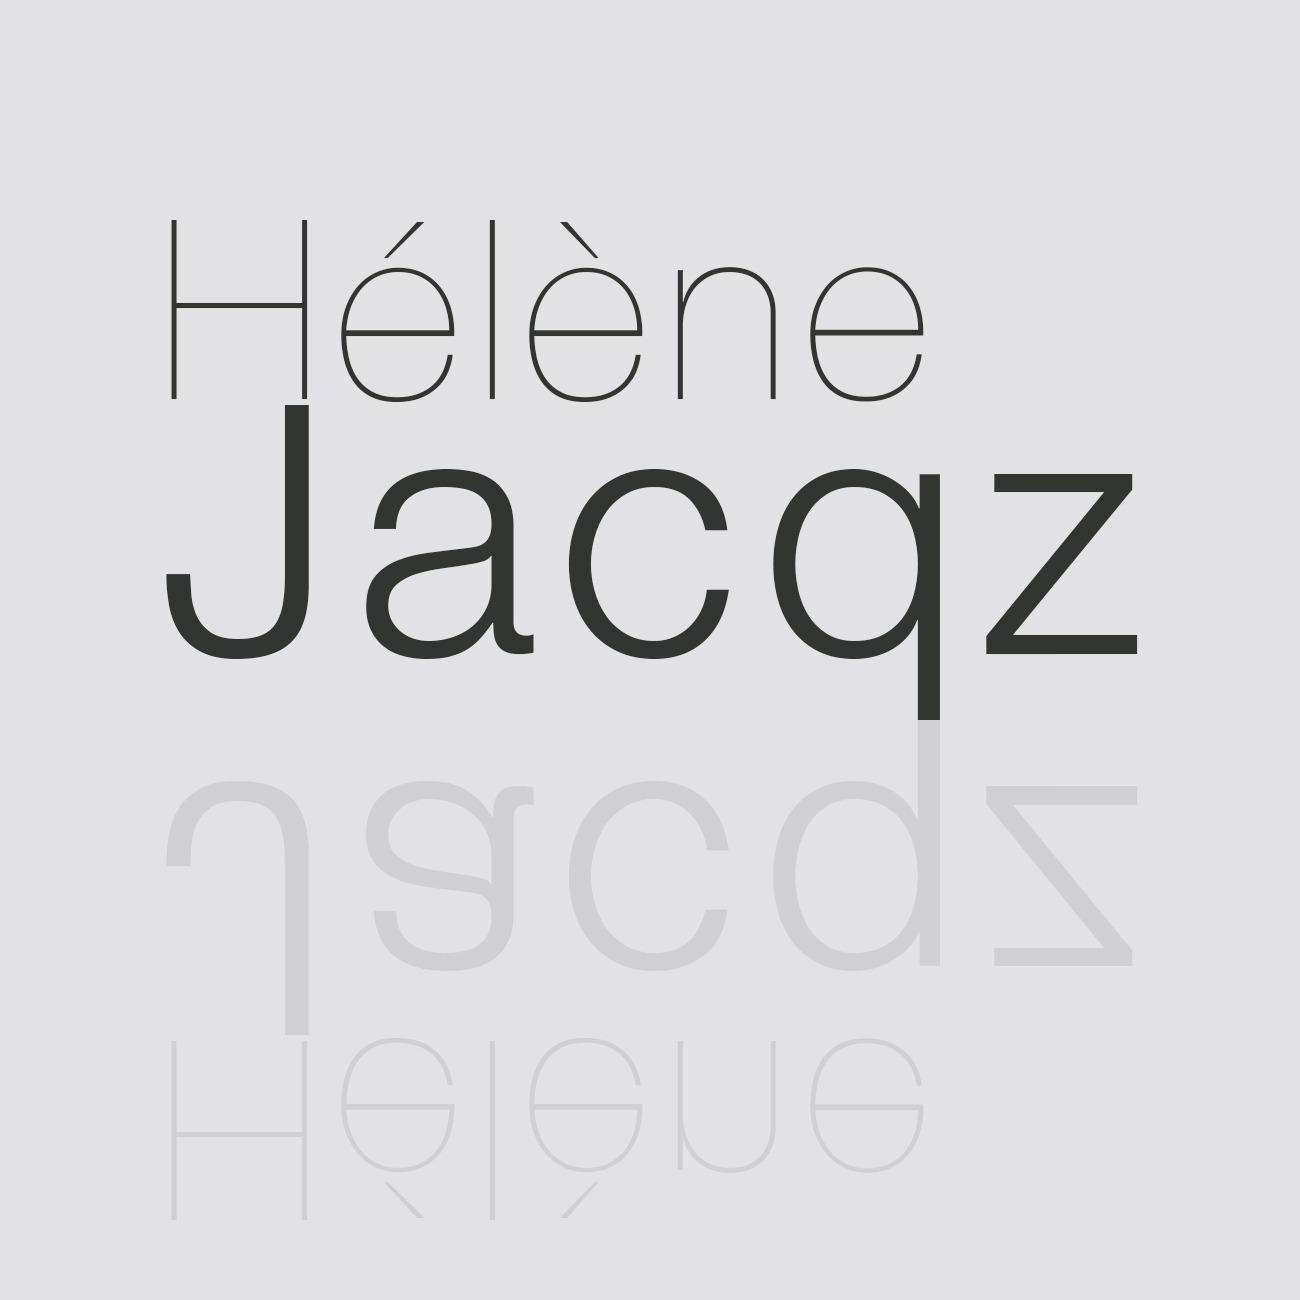 Hélène Jacqz